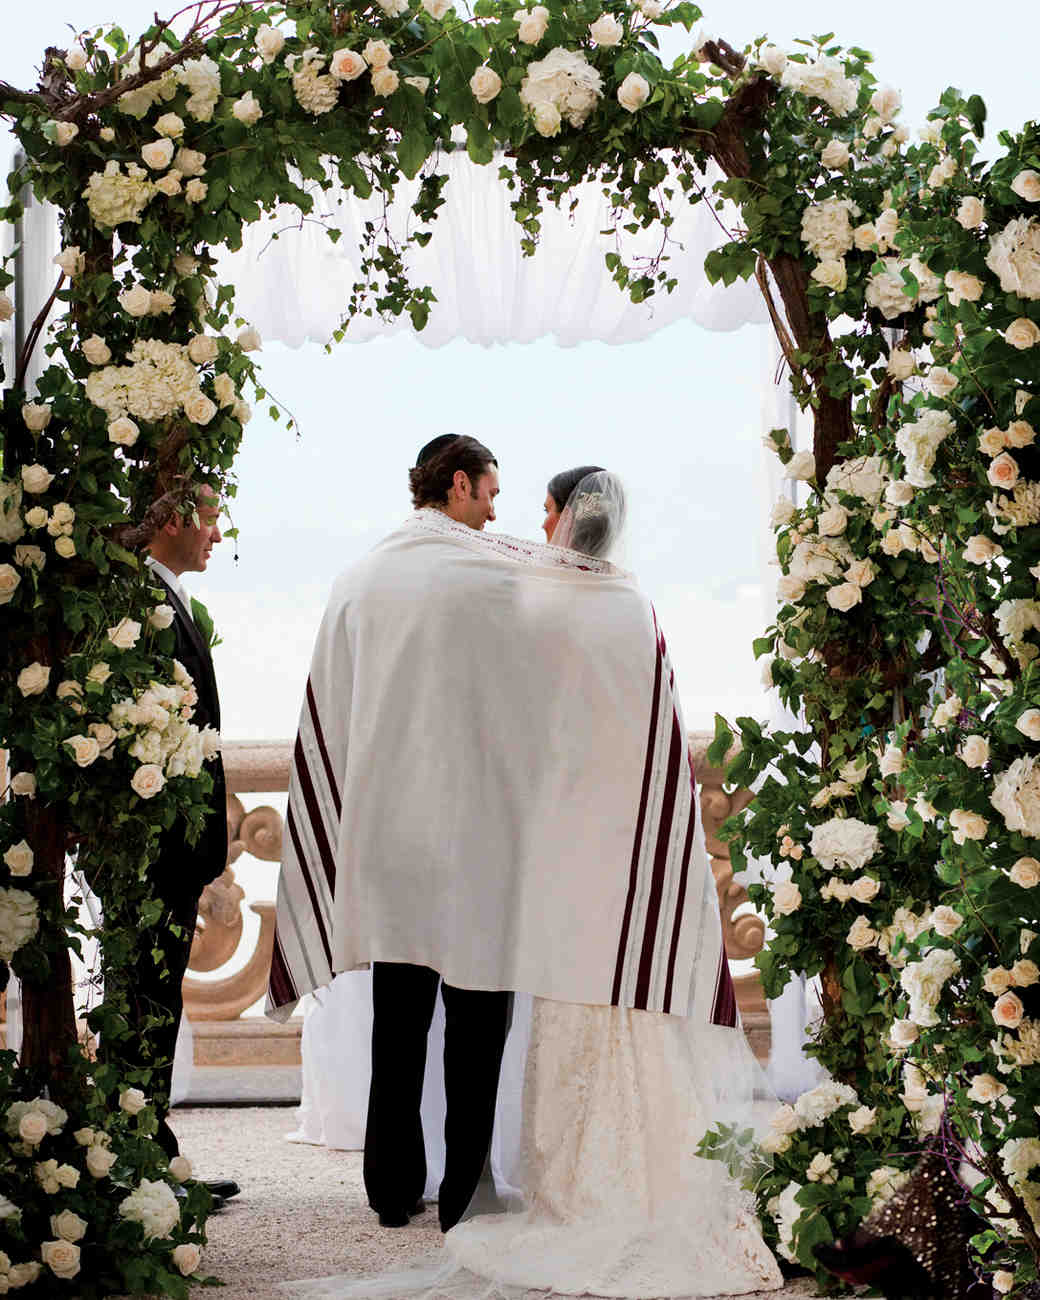 & 51 Beautiful Chuppahs from Jewish Weddings | Martha Stewart Weddings